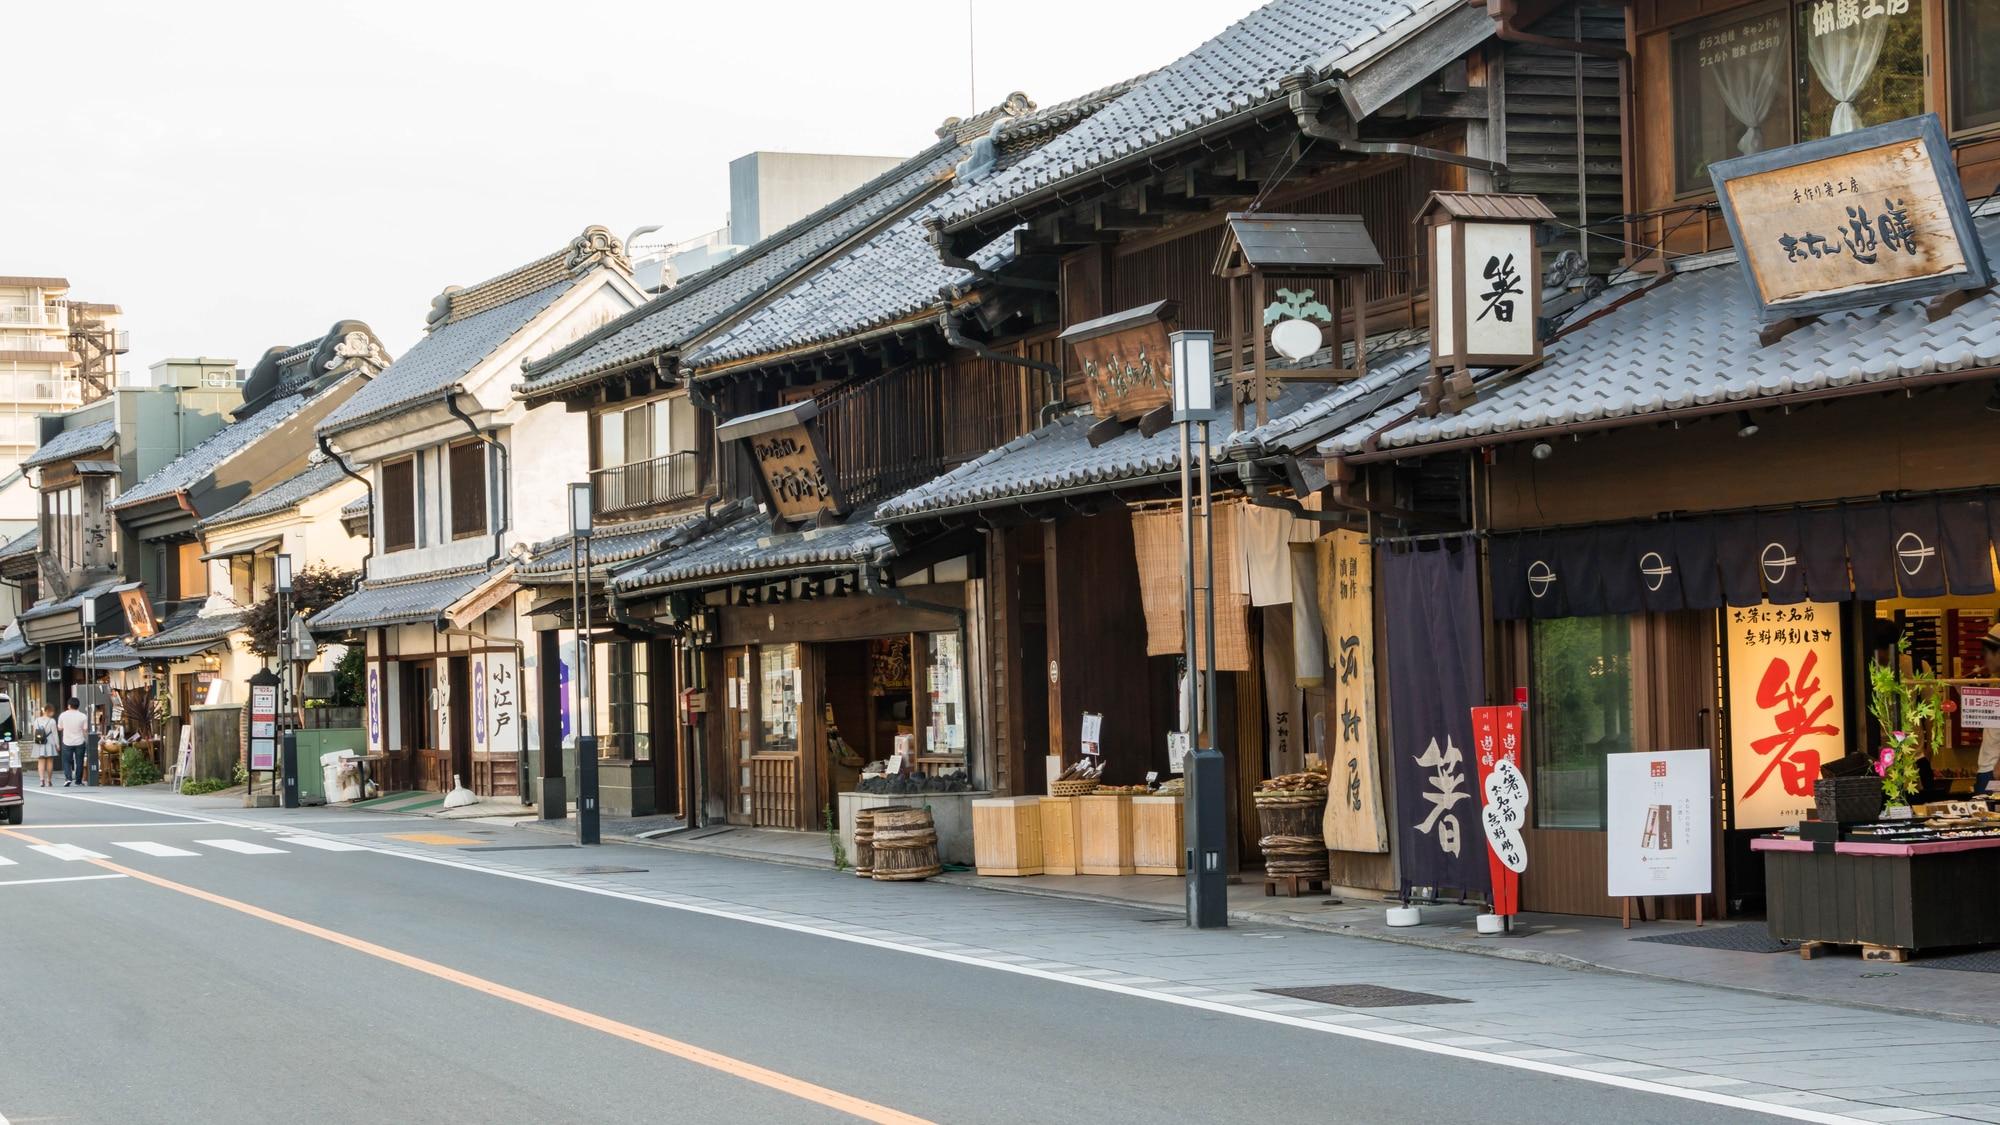 10 Things to Do in Kawagoe, Tokyo's Little Edo Town